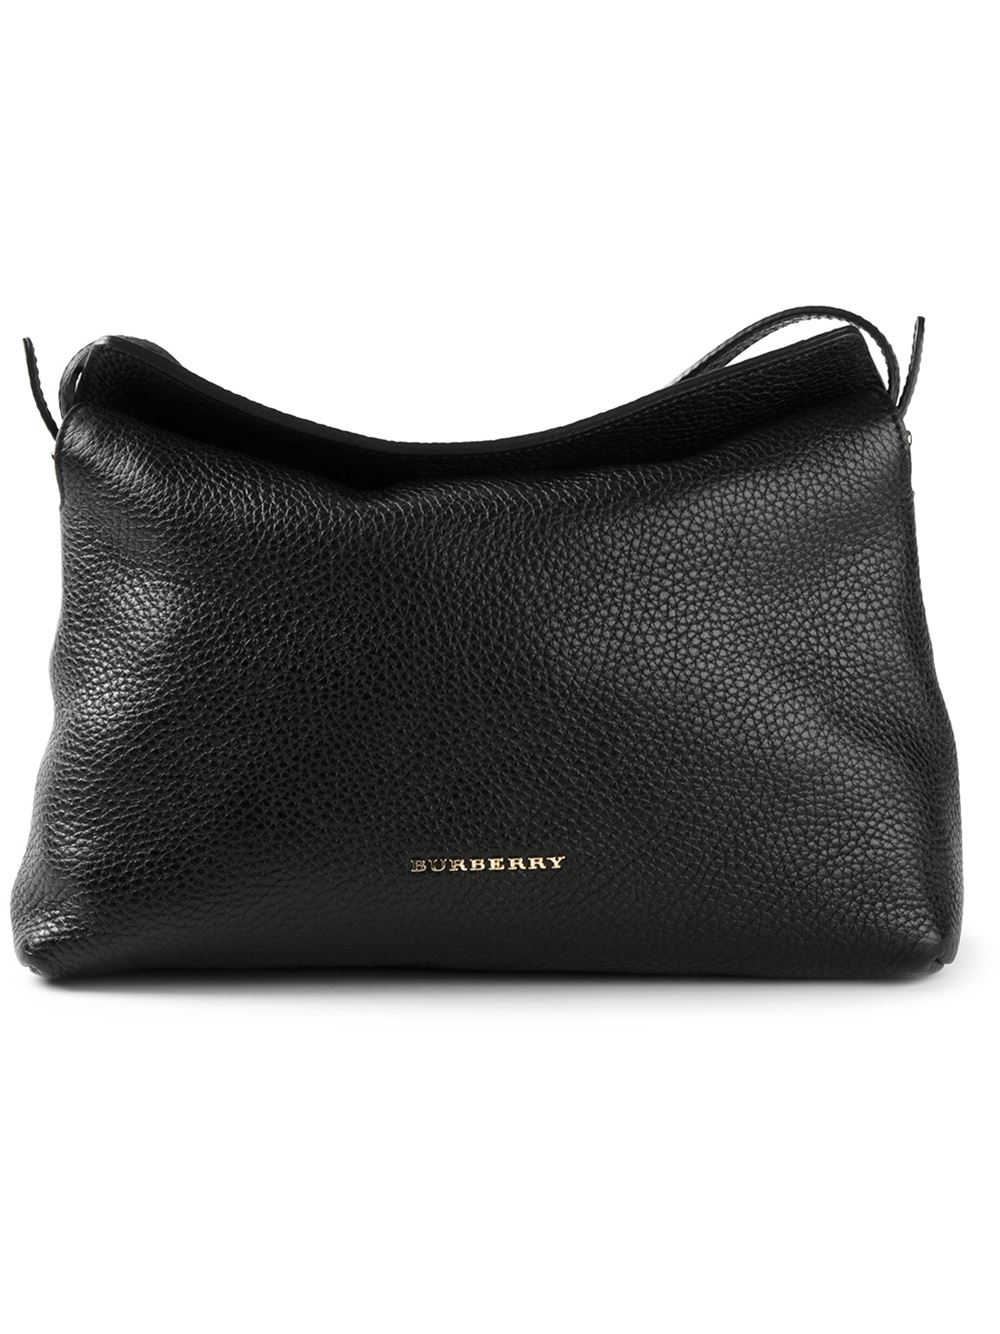 999ae9462864 Lyst - Burberry Grainy Cross Body Bag in Black